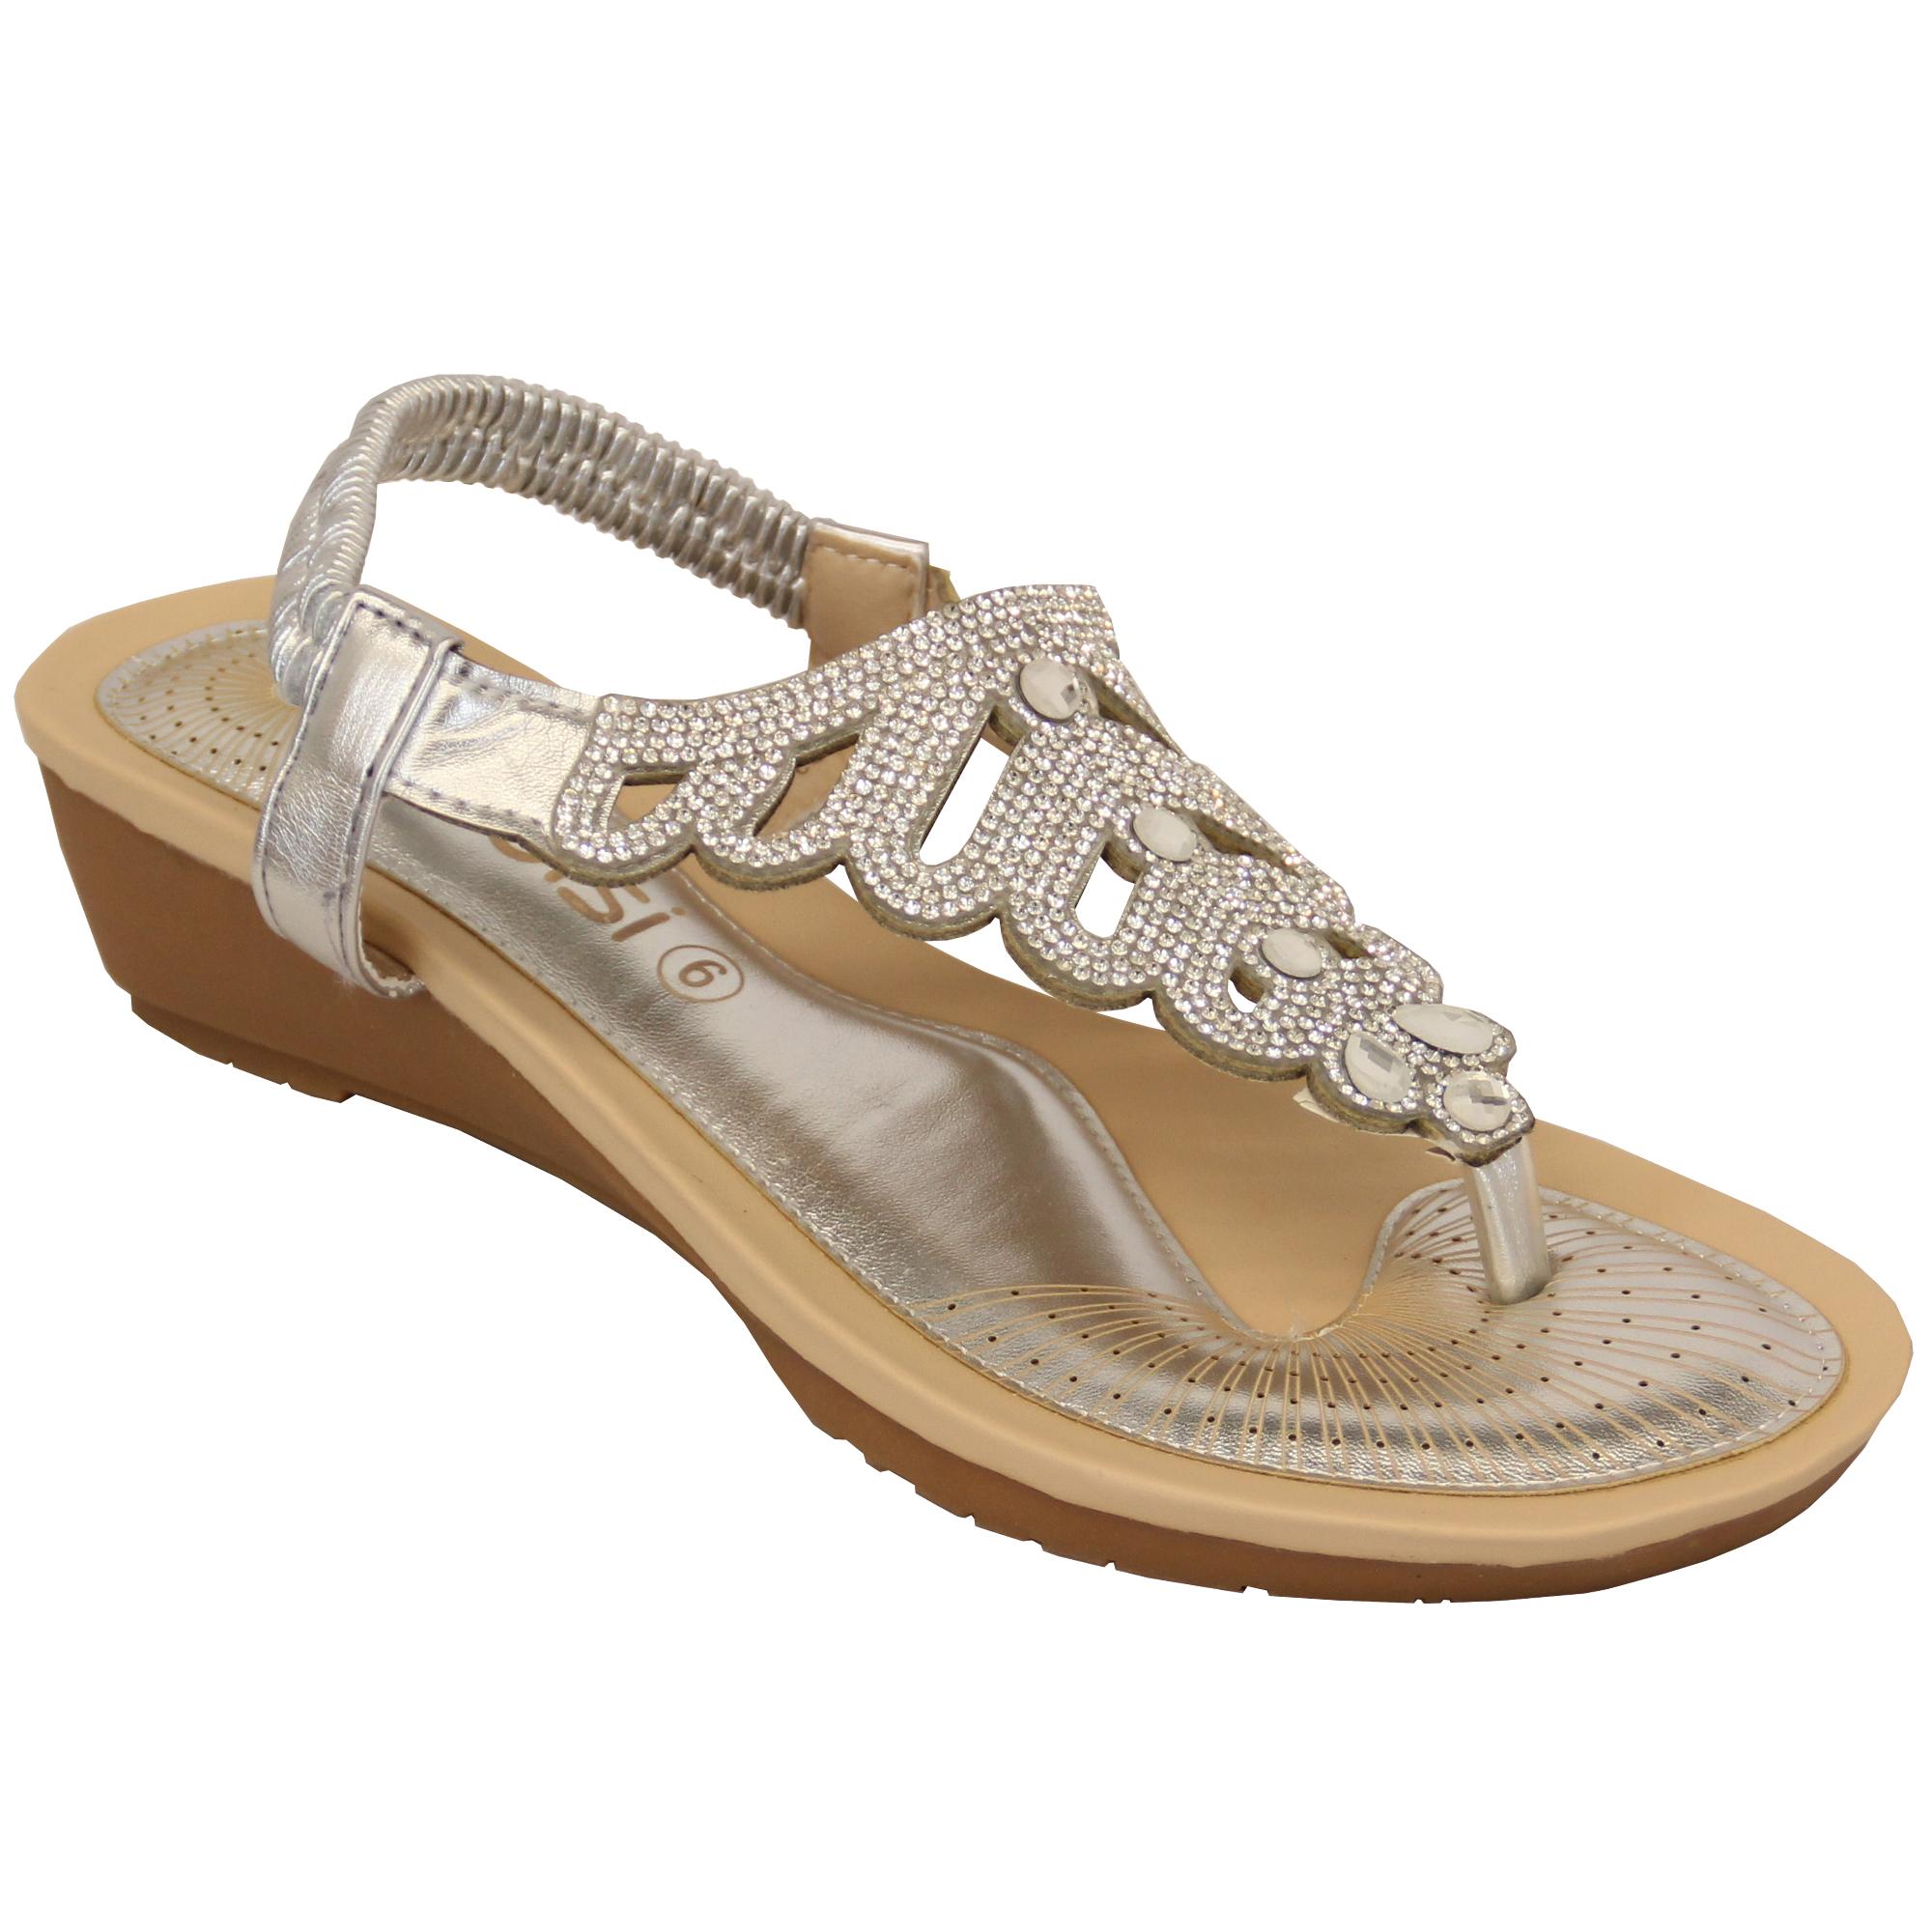 High Heel Toe Post Shoes